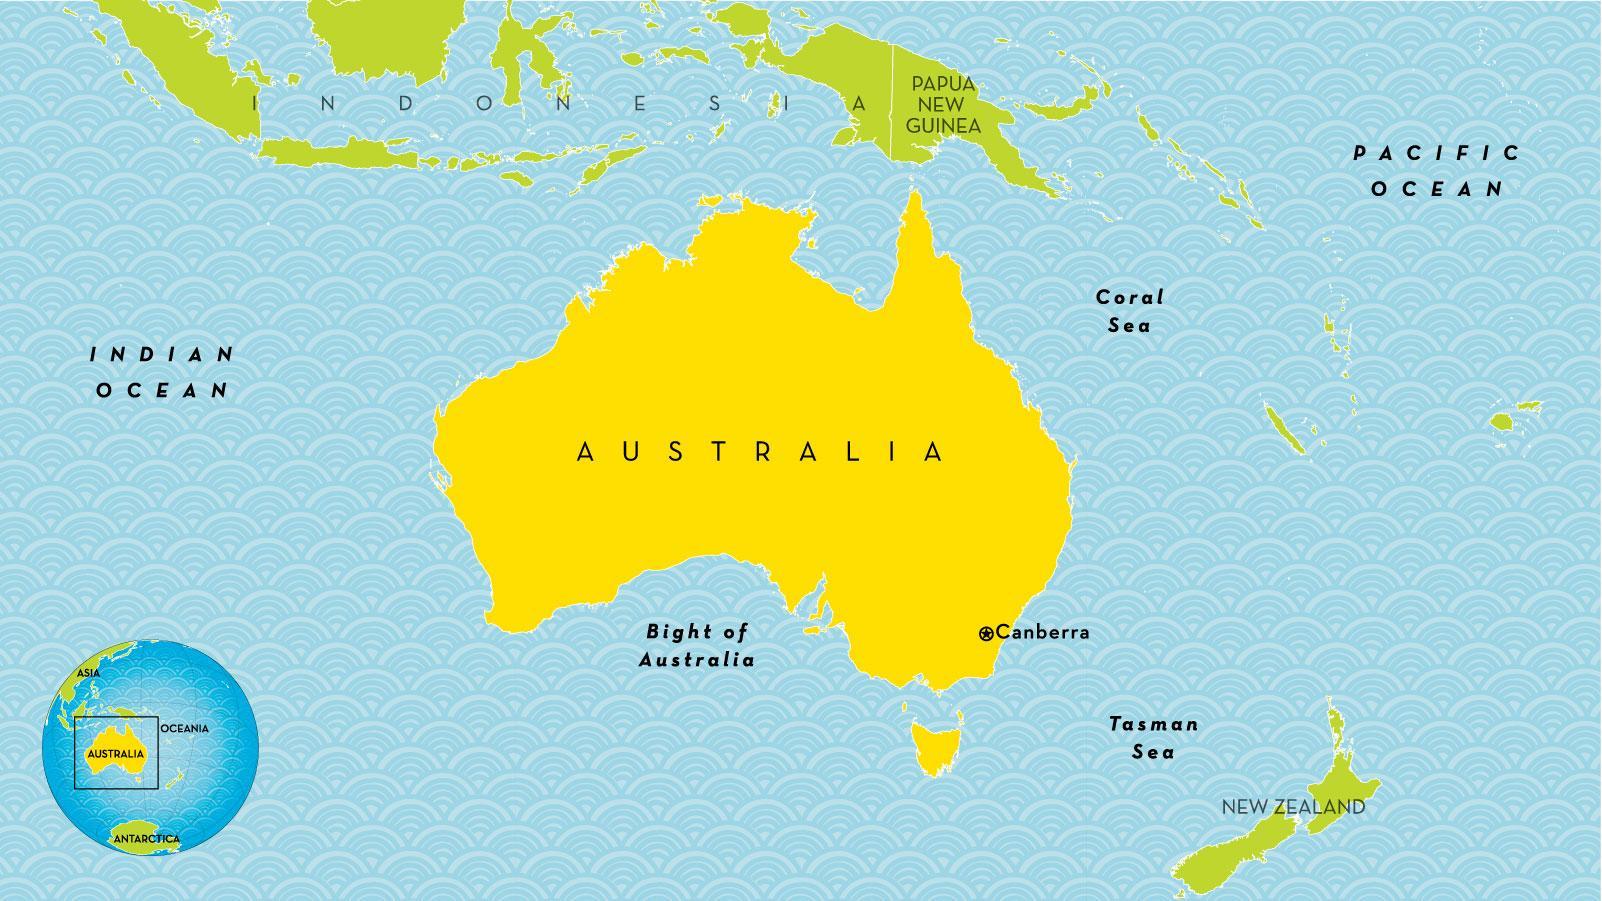 Australien Karta Lander.Australien Land Karta Land Karta Over Australien Australien Och